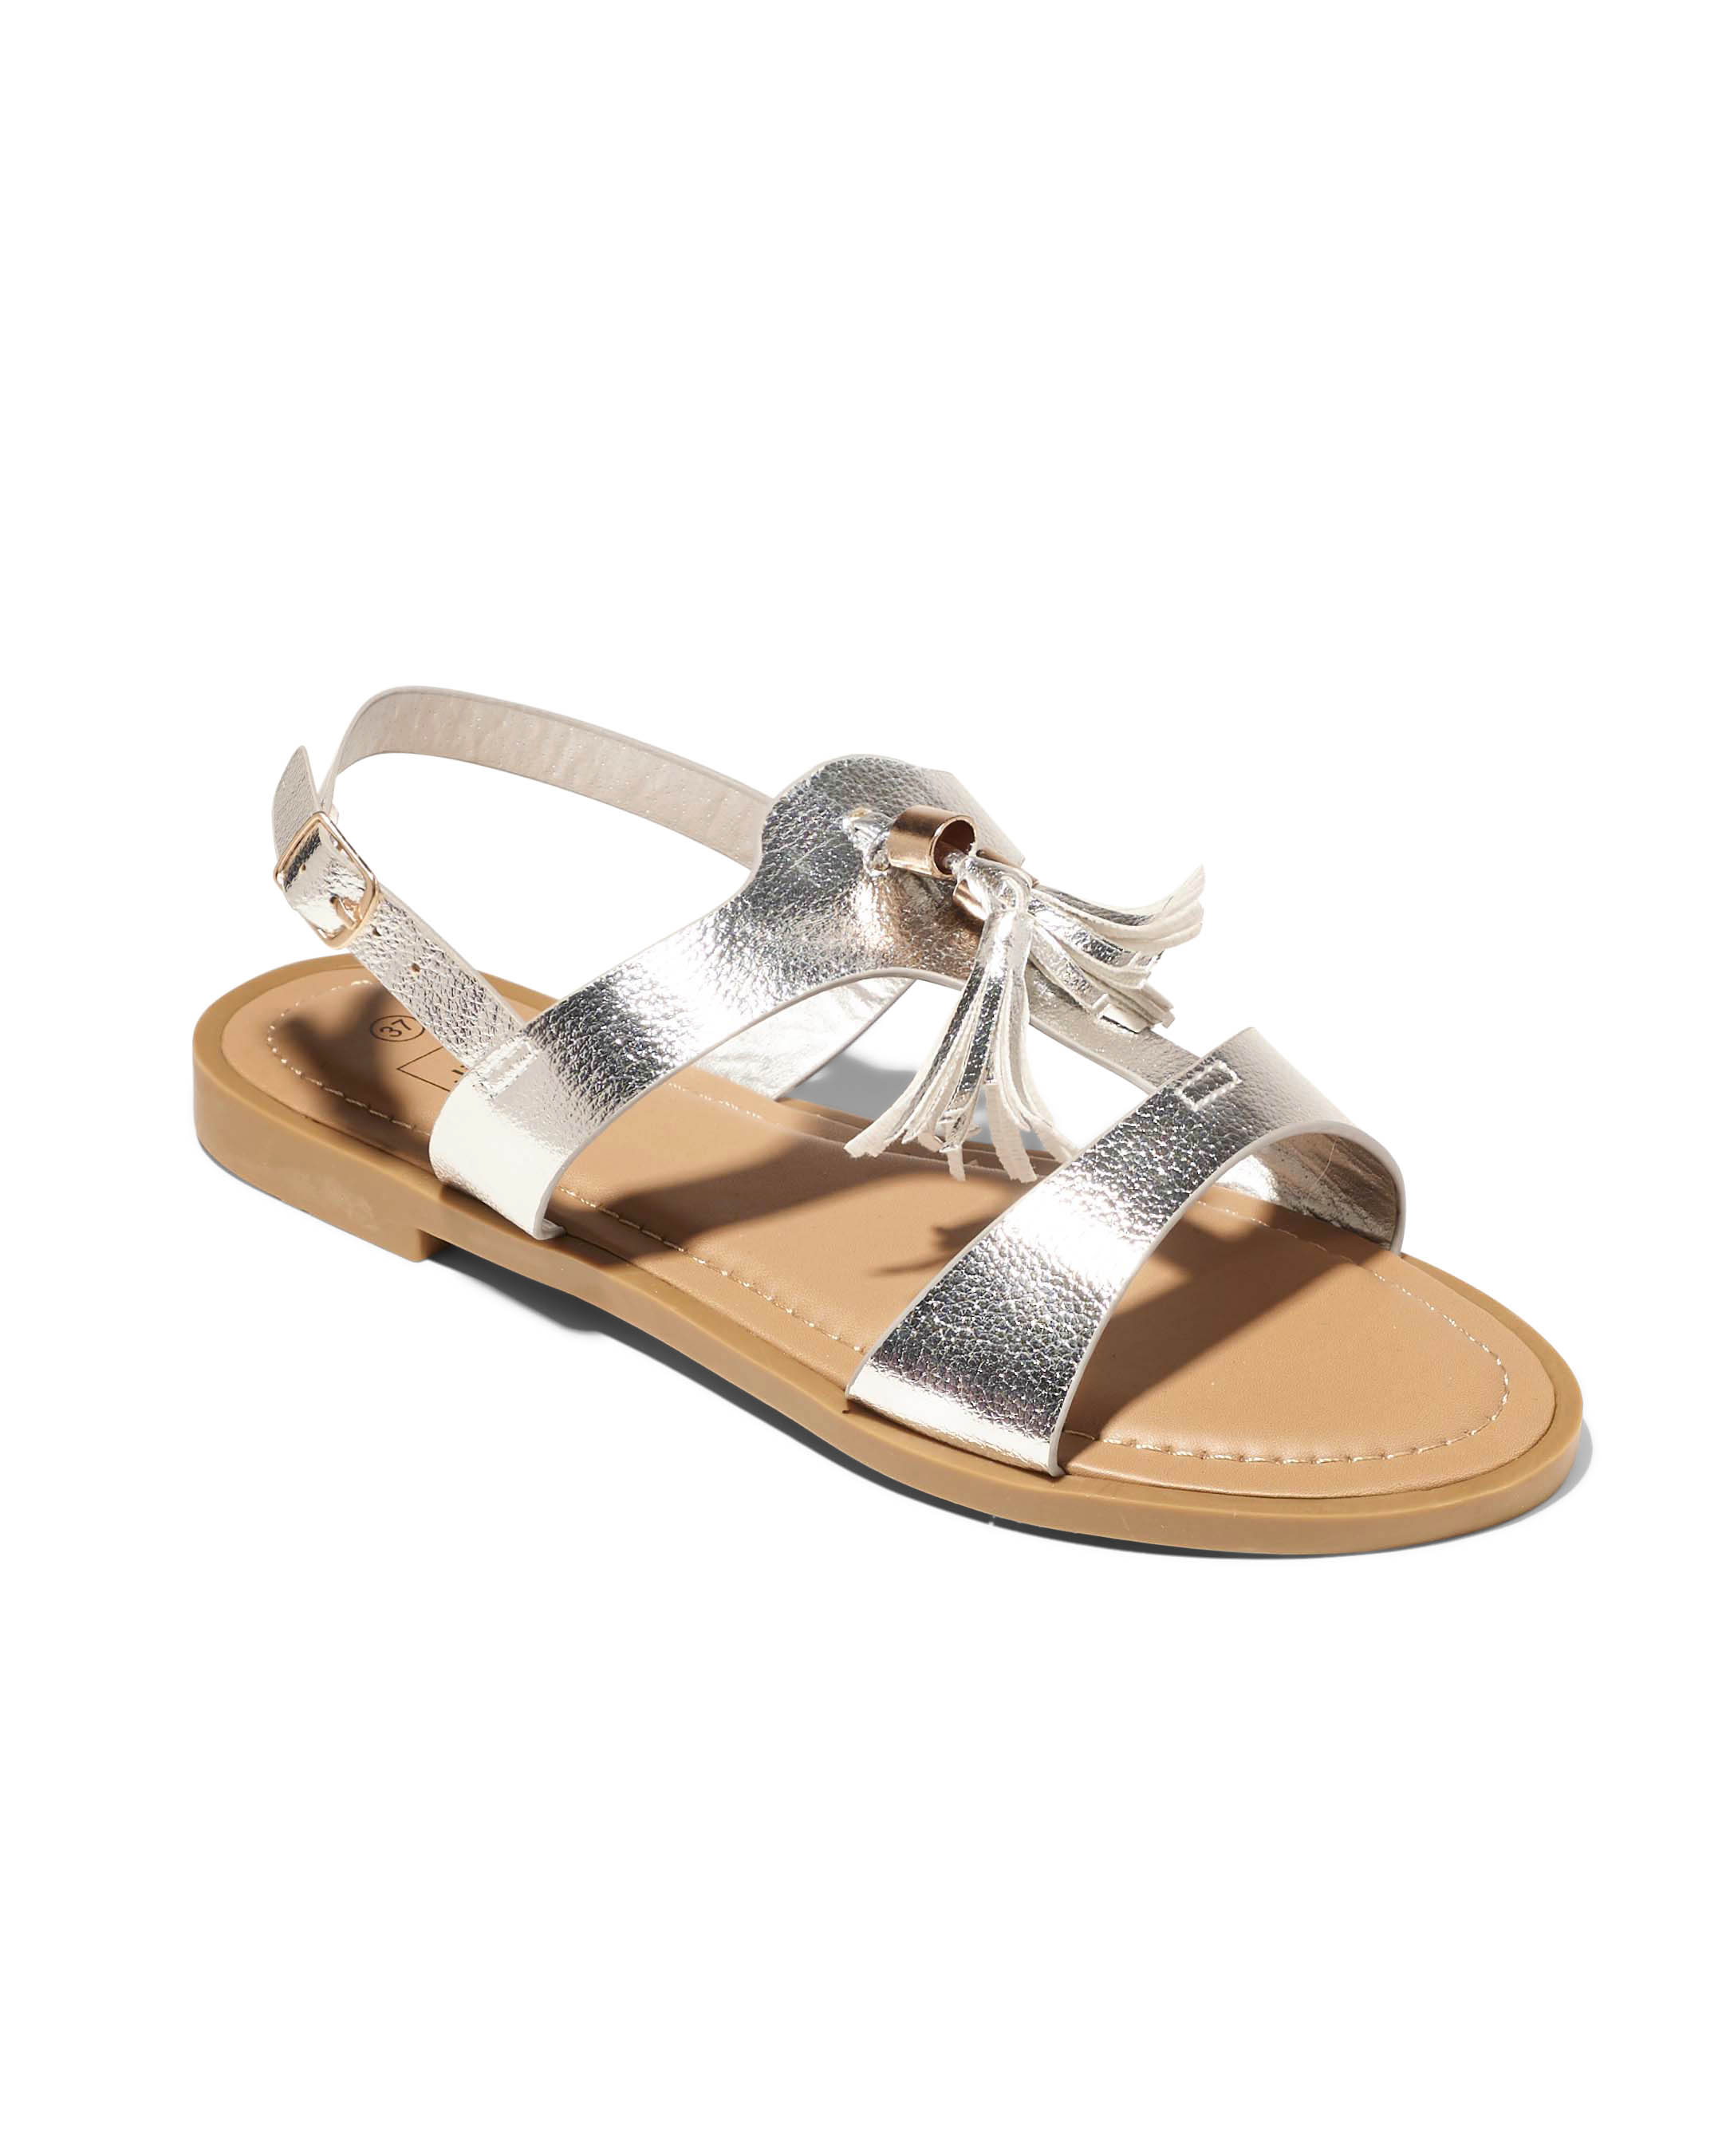 Sandales Plates Femme - Sandale Plate Argent Jina - Fwcz0705-02